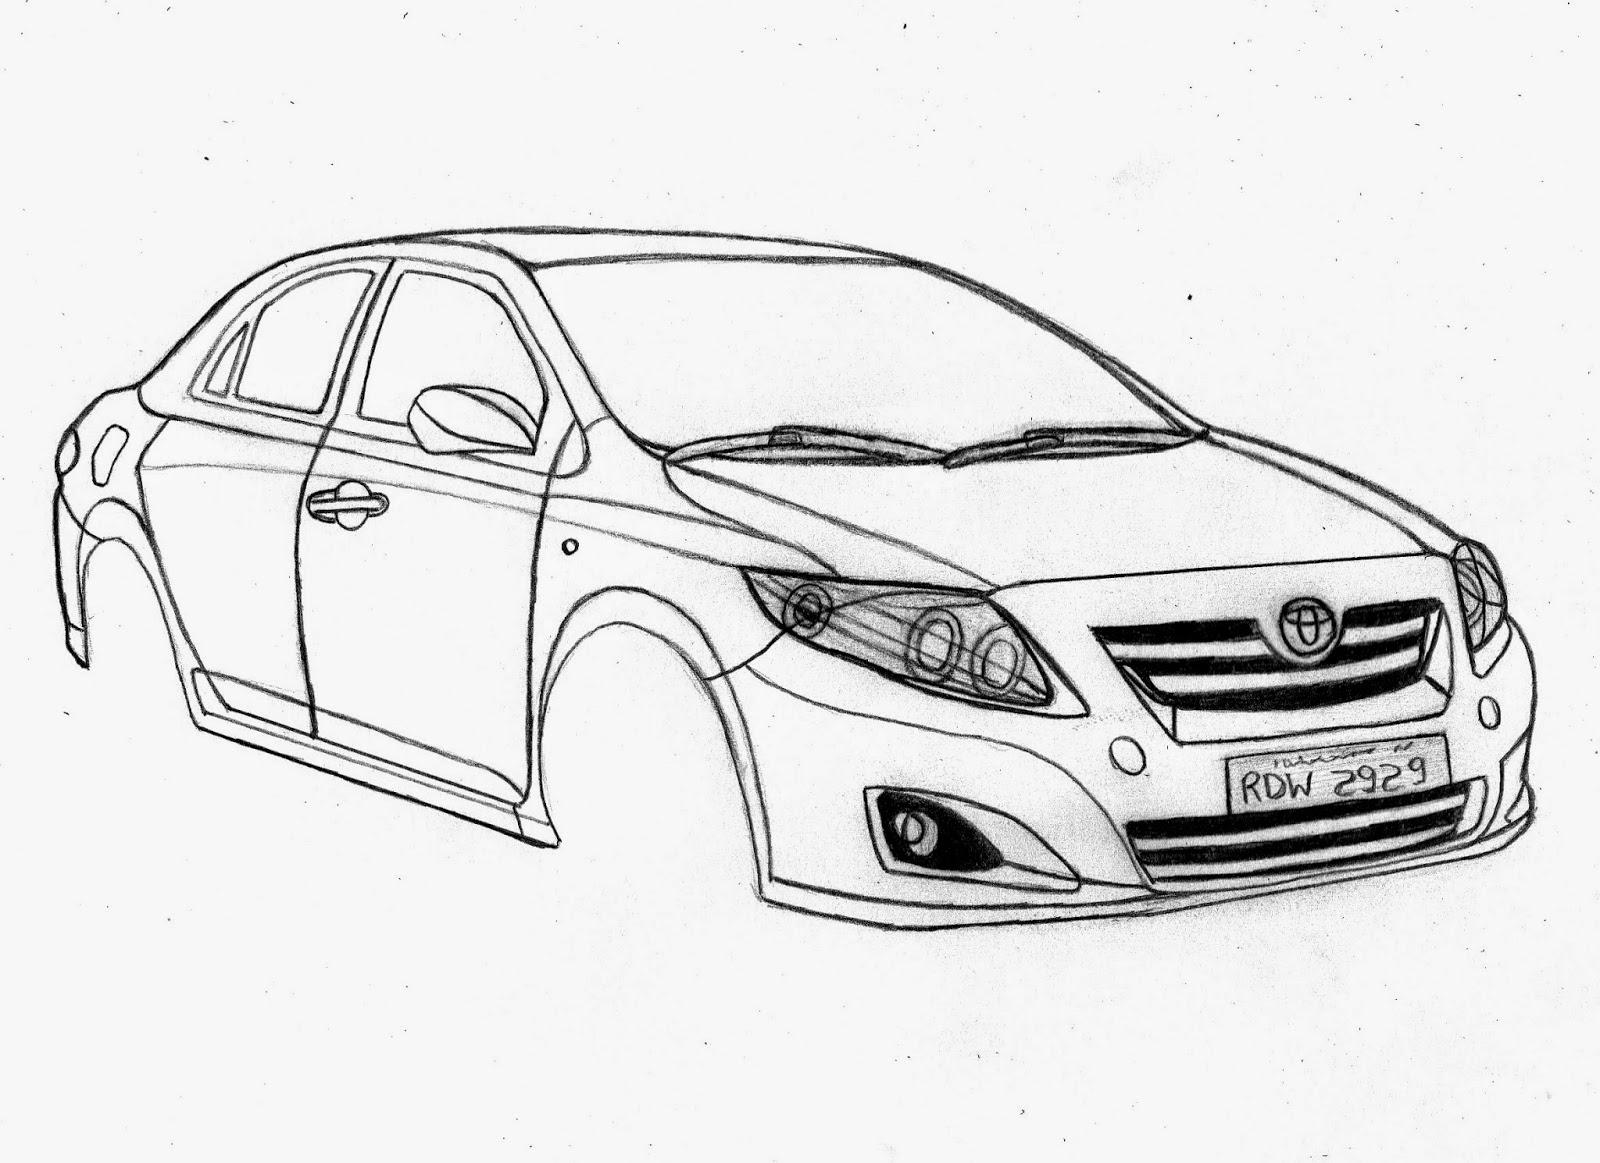 Guuhdesenhos Como Desenhar Um Toyota Corolla